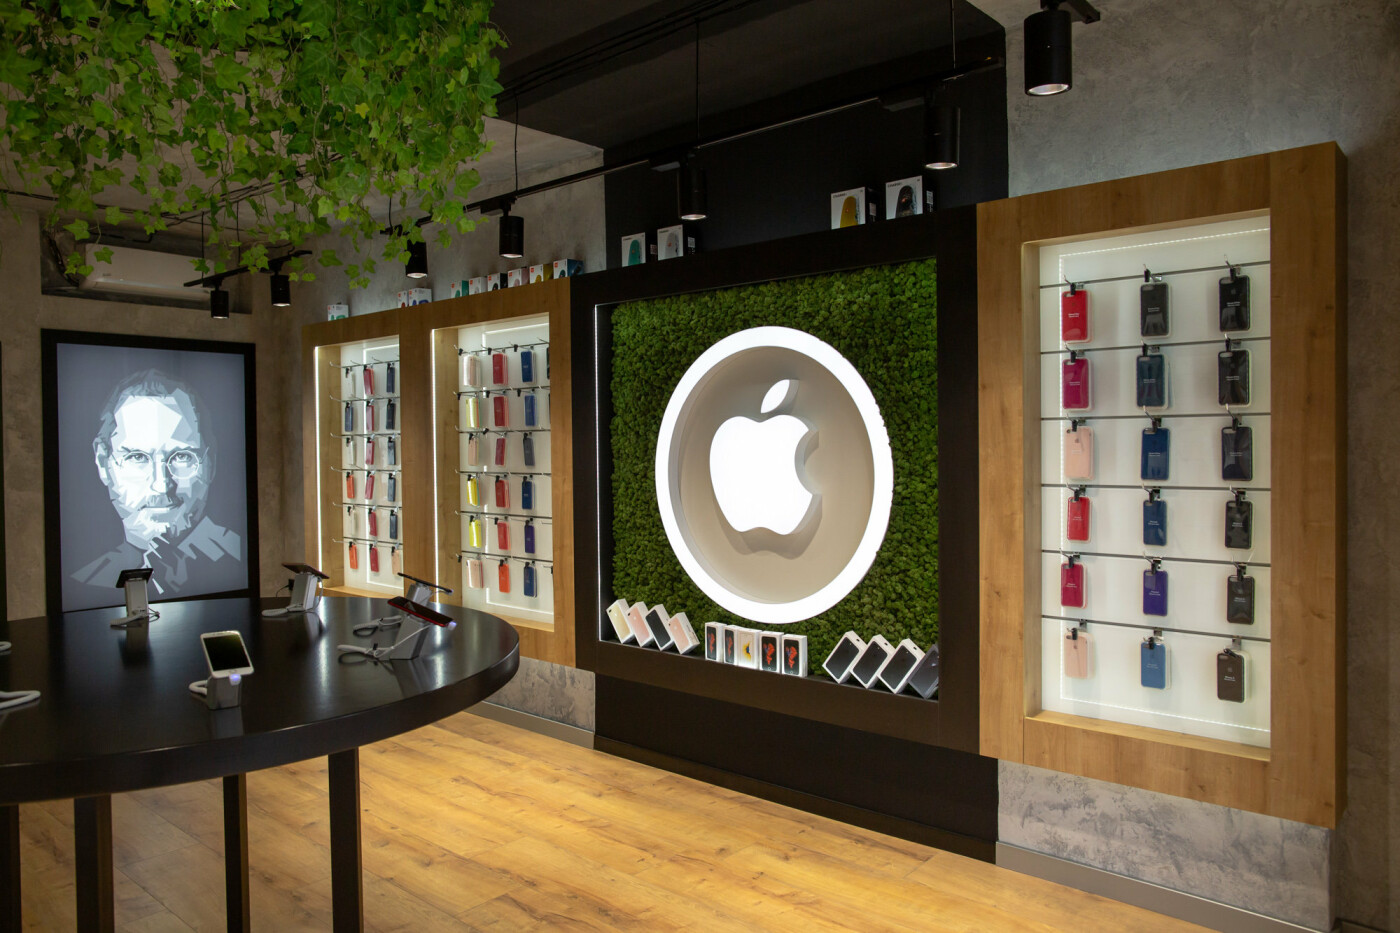 iPhone SE 2020 – найдешевший смартфон Apple вже в Apple Room, фото-1